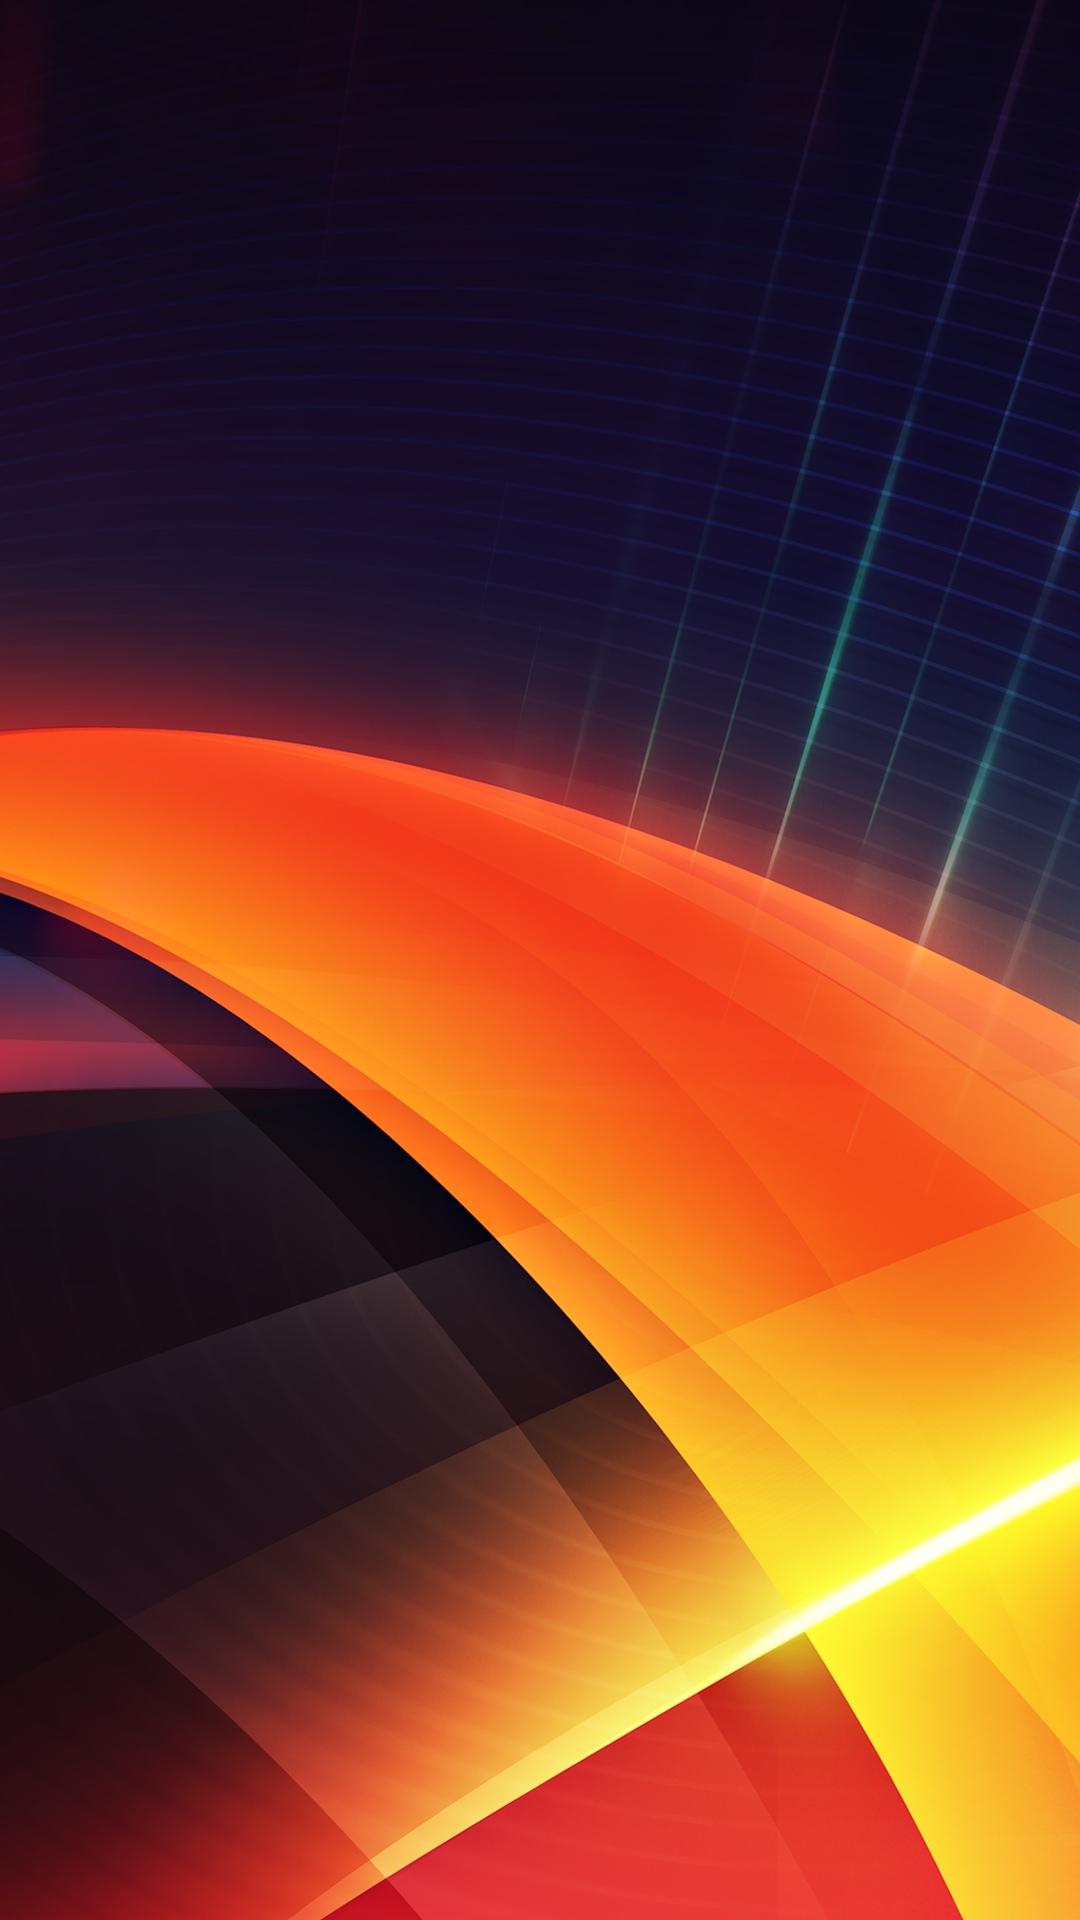 Futuristic Orange Layers Illustration iPhone 6 Plus HD Wallpaper